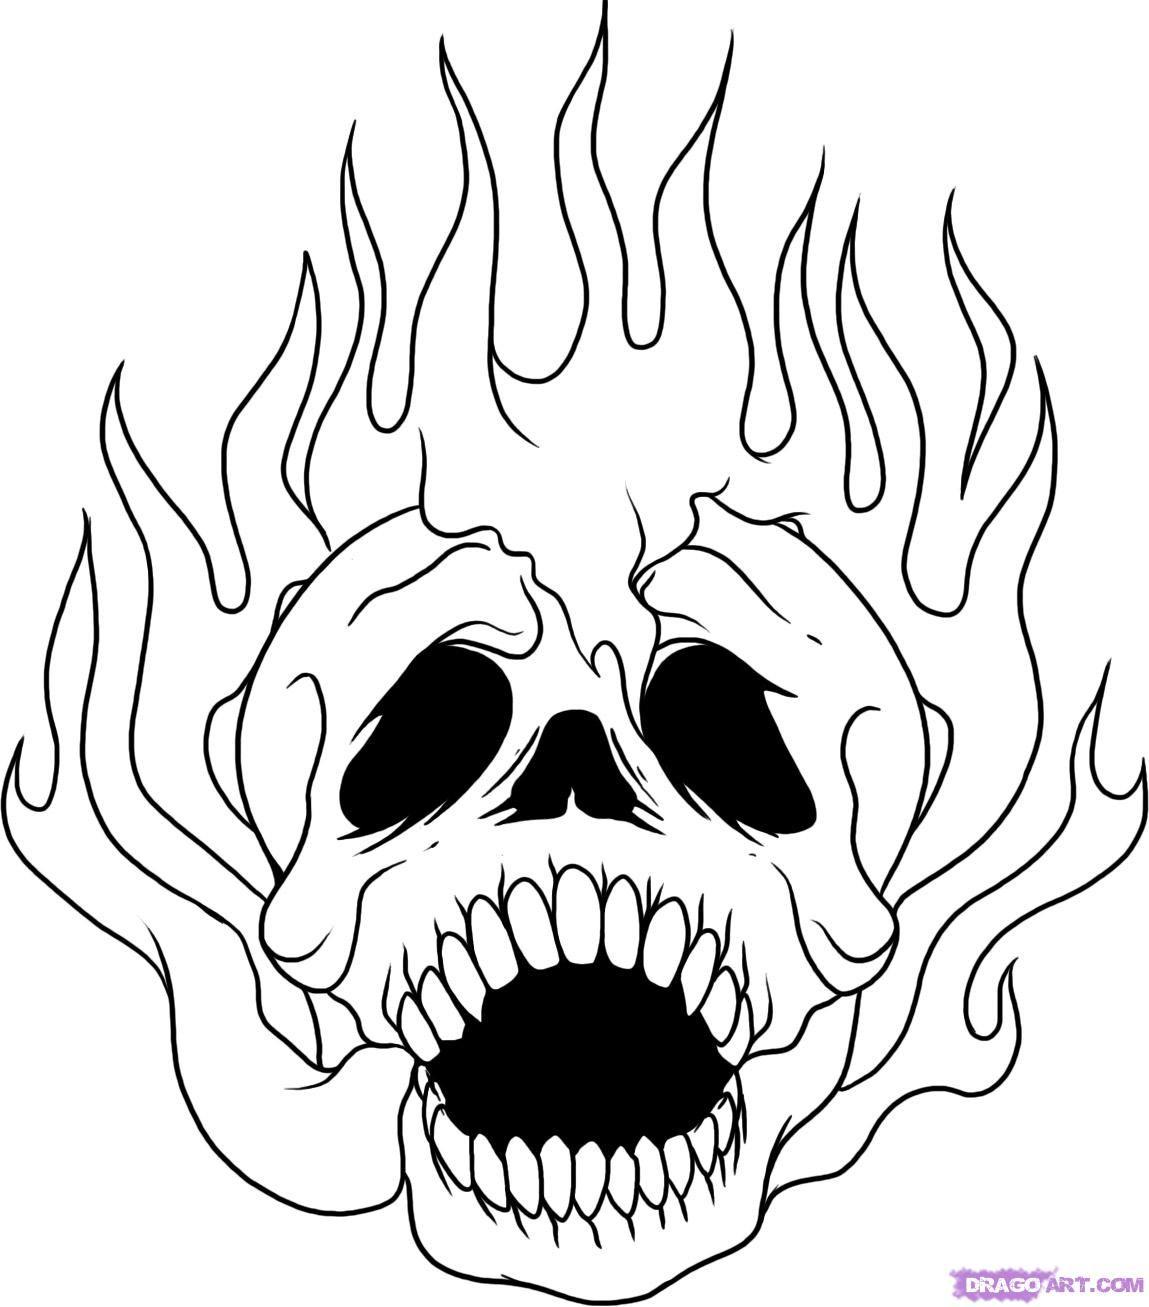 1149x1307 Graffiti Skulls To Colour Pics Of Flaming Skulls Coloring Pages